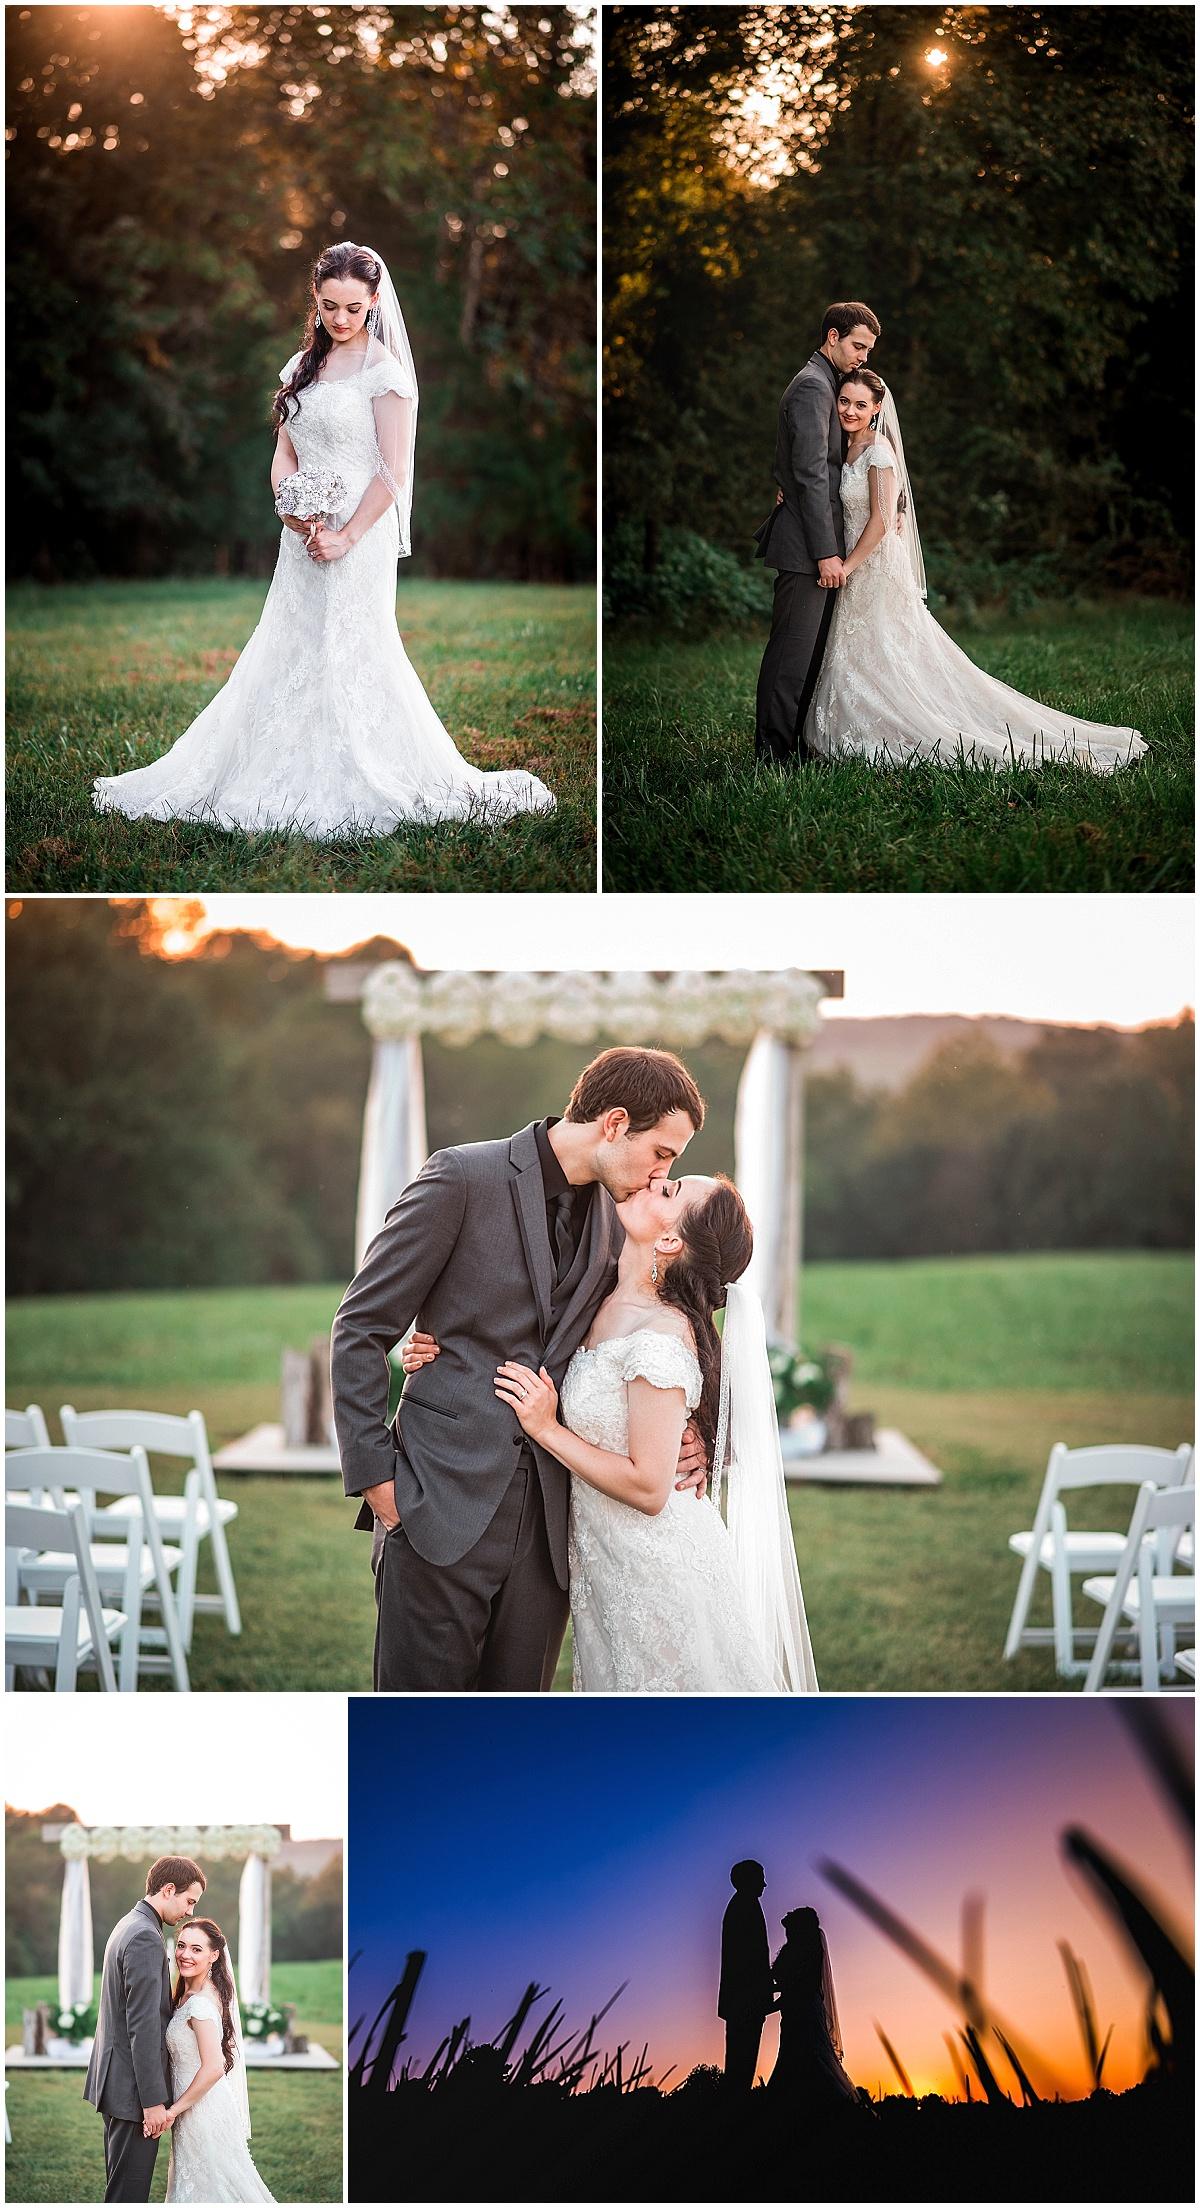 nadia_adam_wedding-9147.jpg